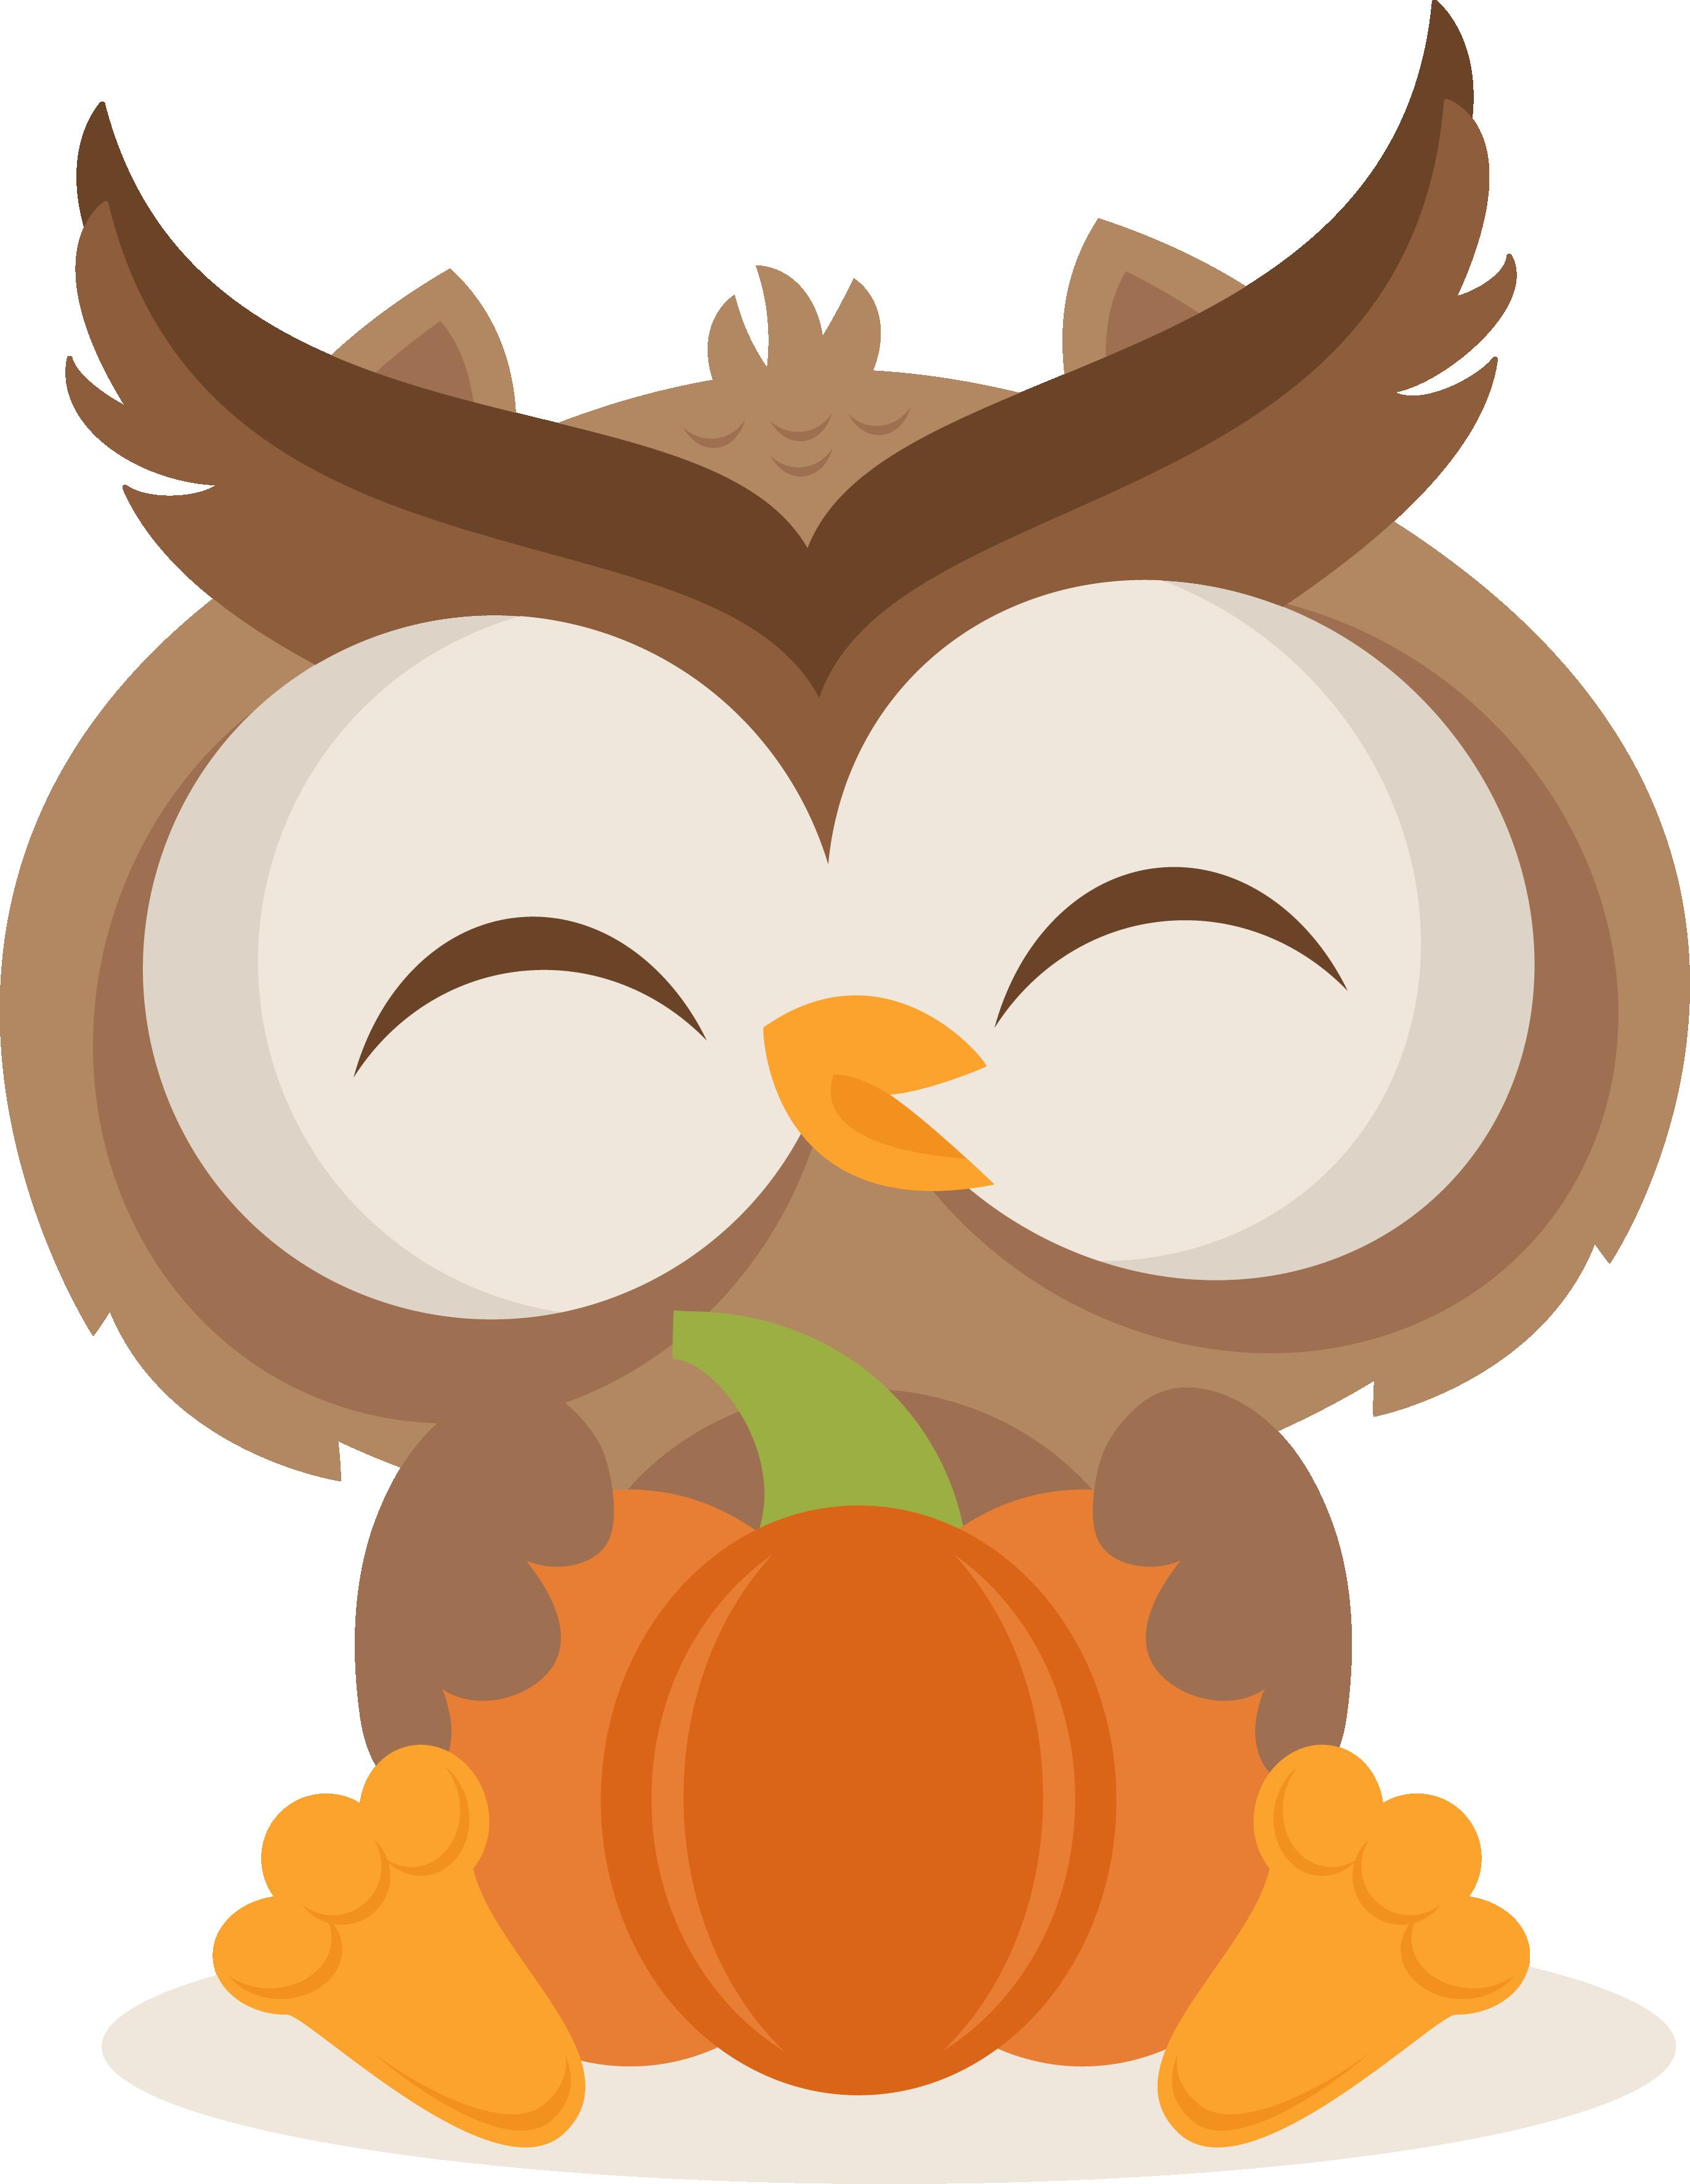 Mkc fallowl svg s. Fox clipart thanksgiving